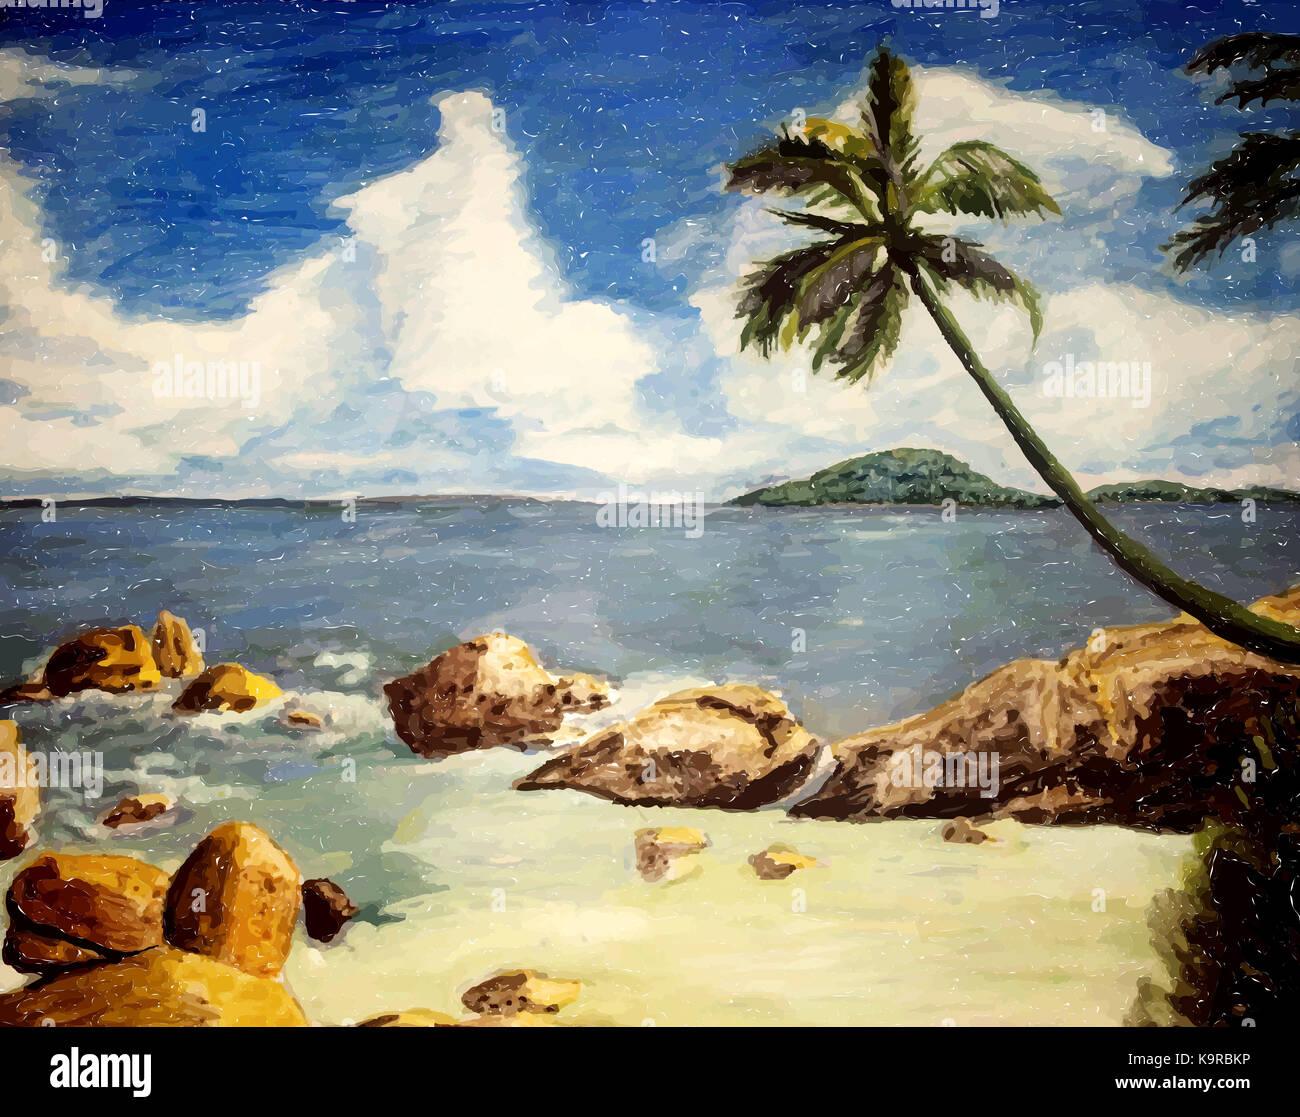 paradise tropical island. beach with palm, sand and sea. Stock Photo